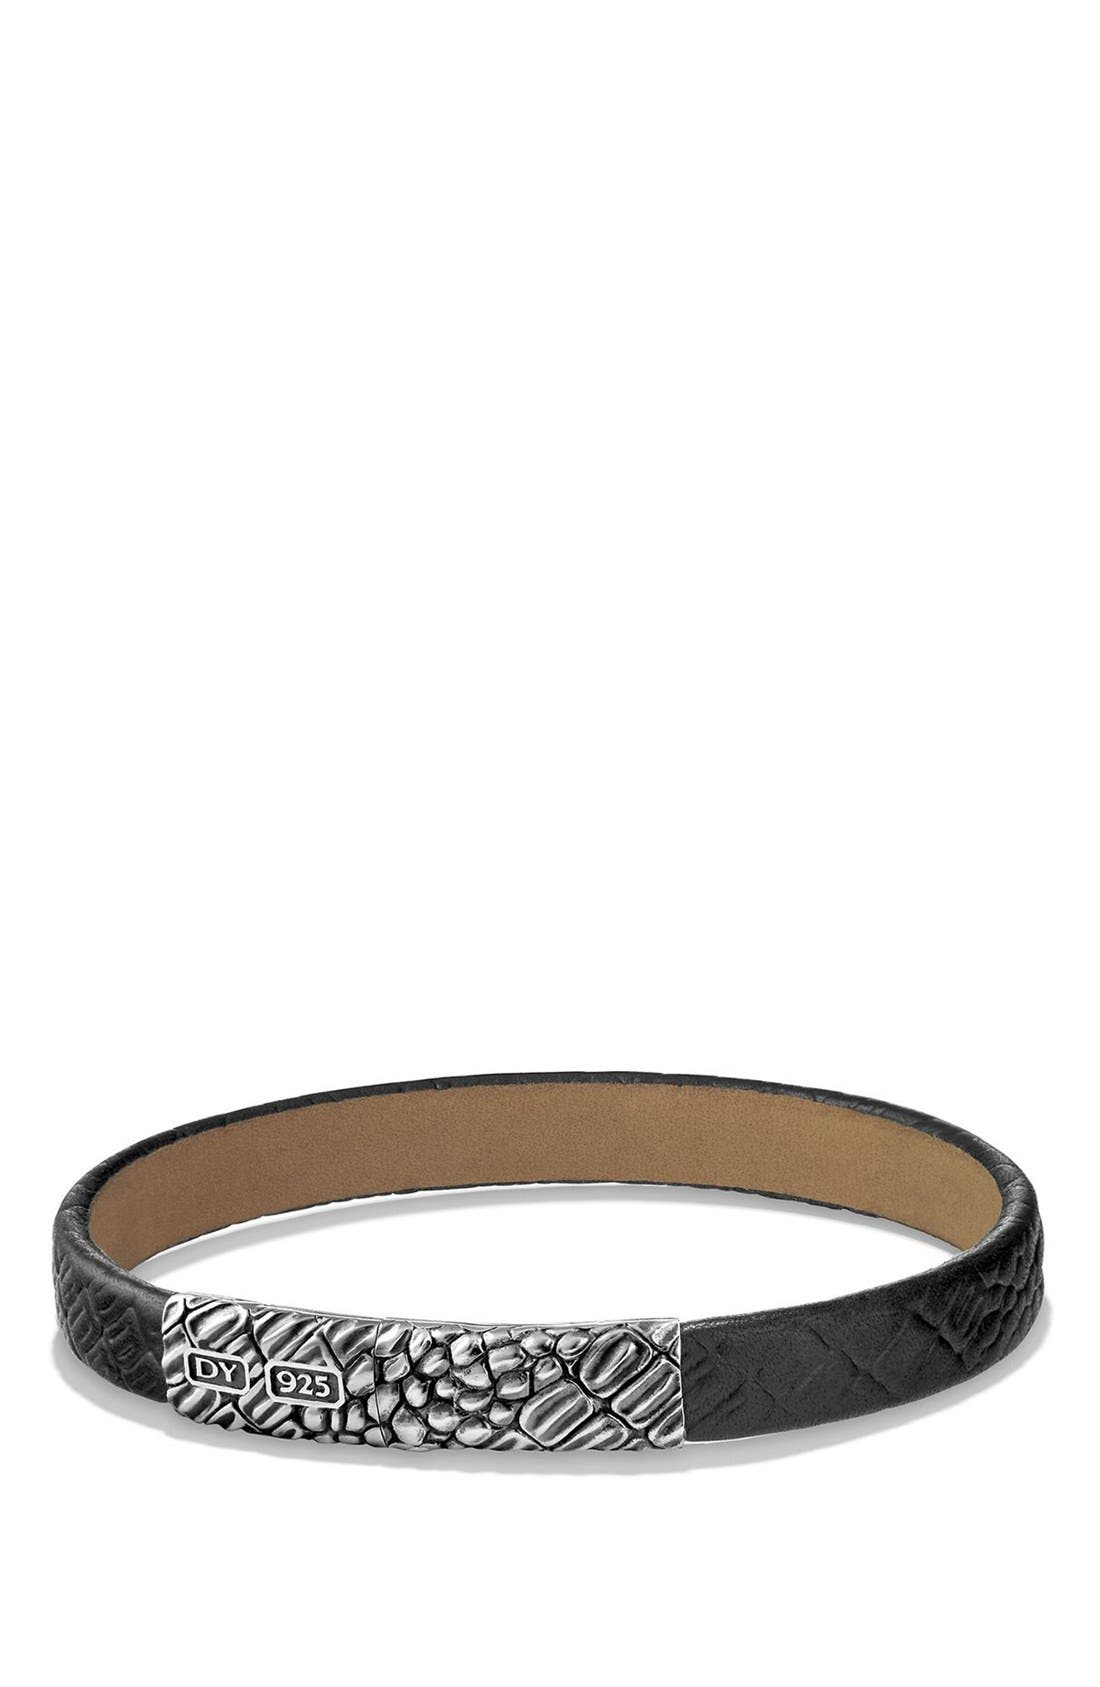 Gator Leather Bracelet,                         Main,                         color, Silver/ Black Leather